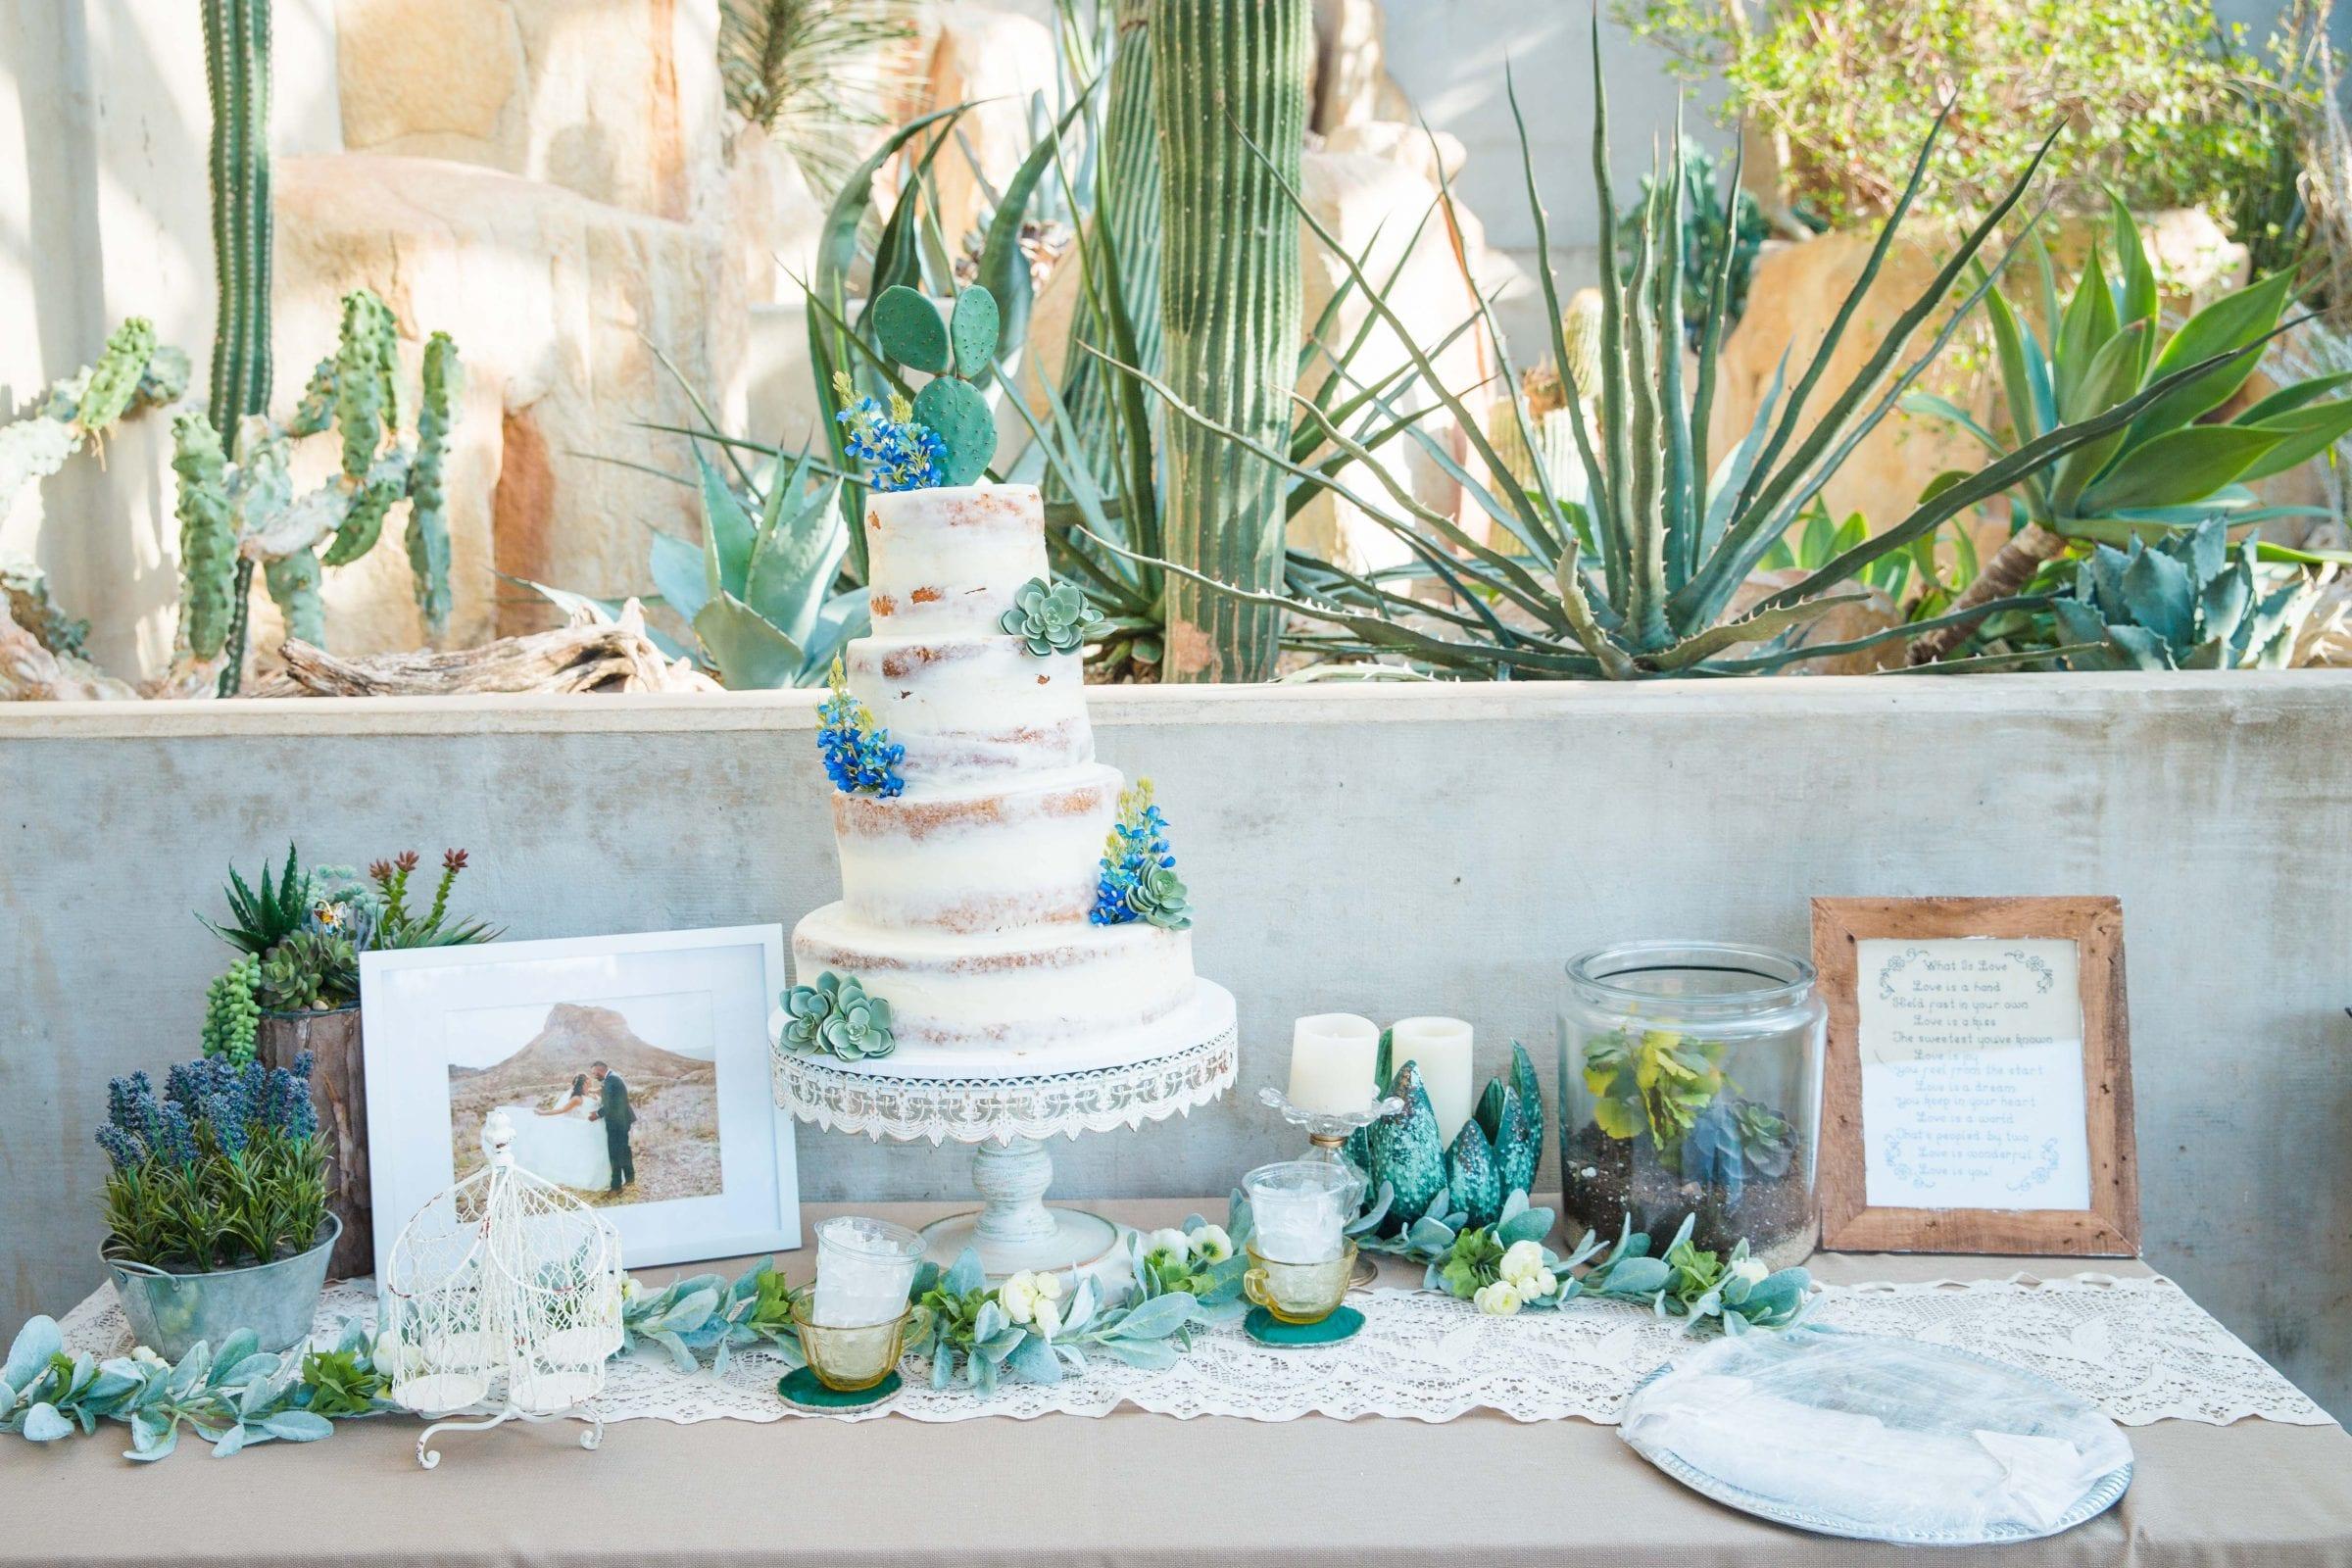 Courtney Amaya wedding San Antonio Botanical Garden cake table